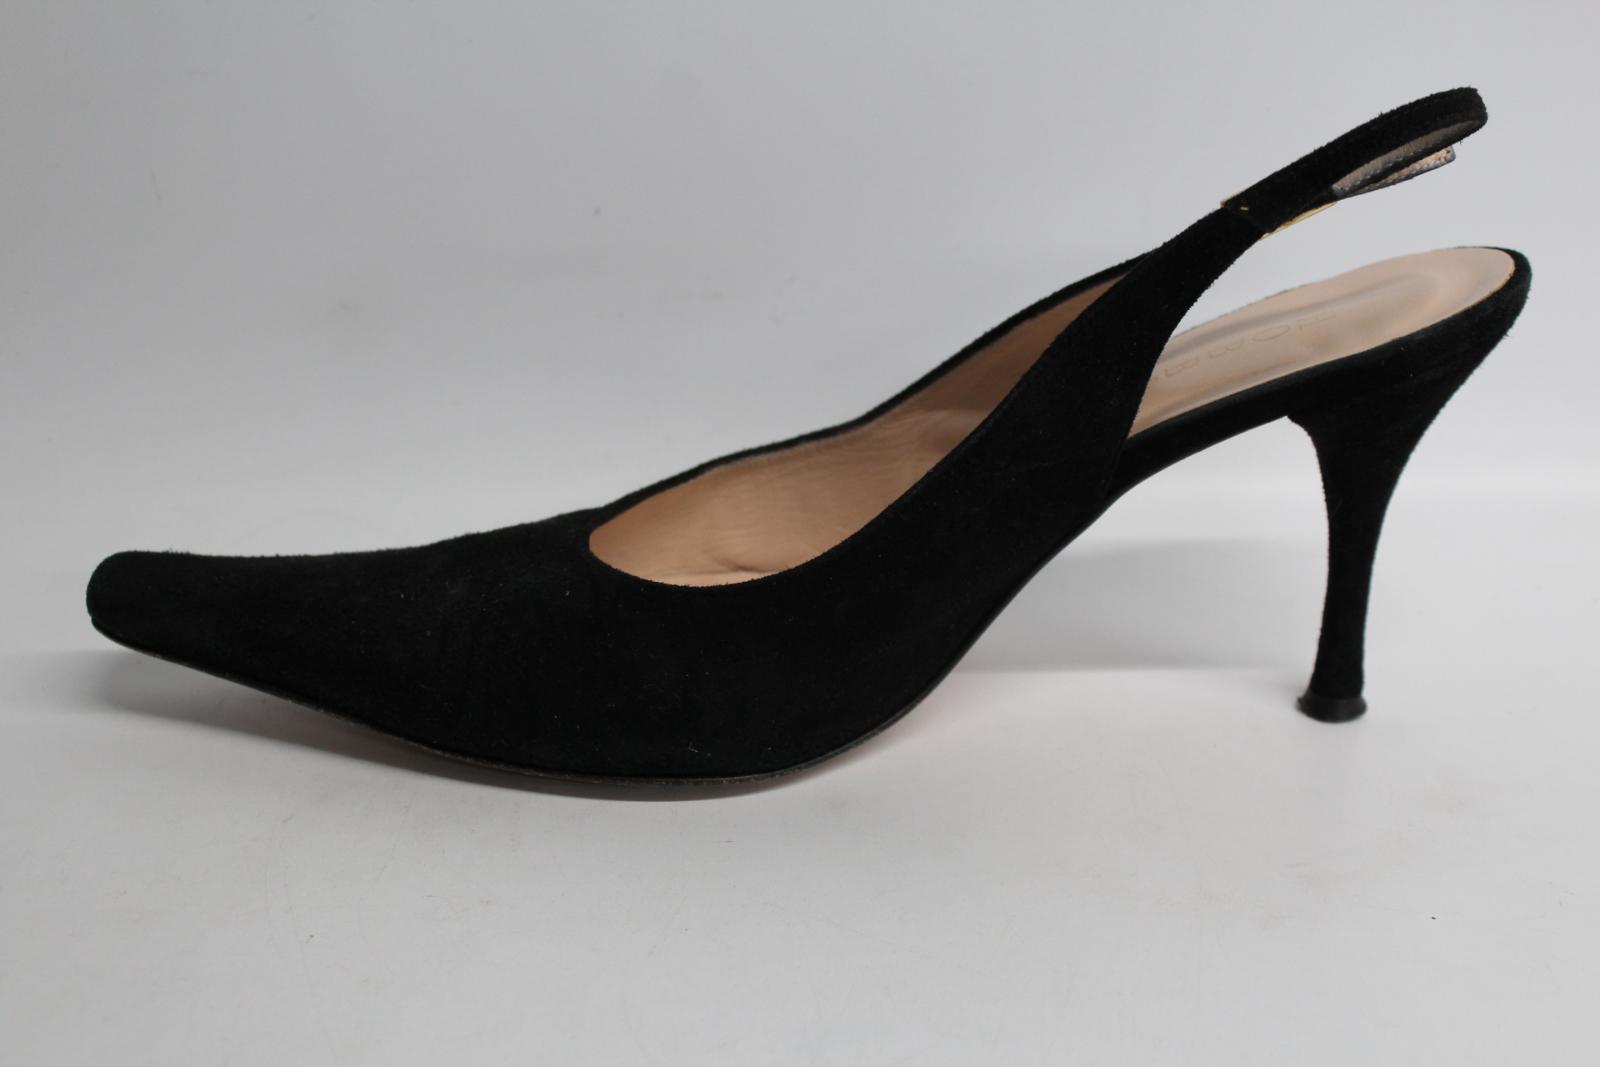 Hobbs-femmes-en-daim-noir-Sling-Arriere-bout-pointu-et-talon-aiguille-Chaussure-UK6-5-EU39-5 miniature 10